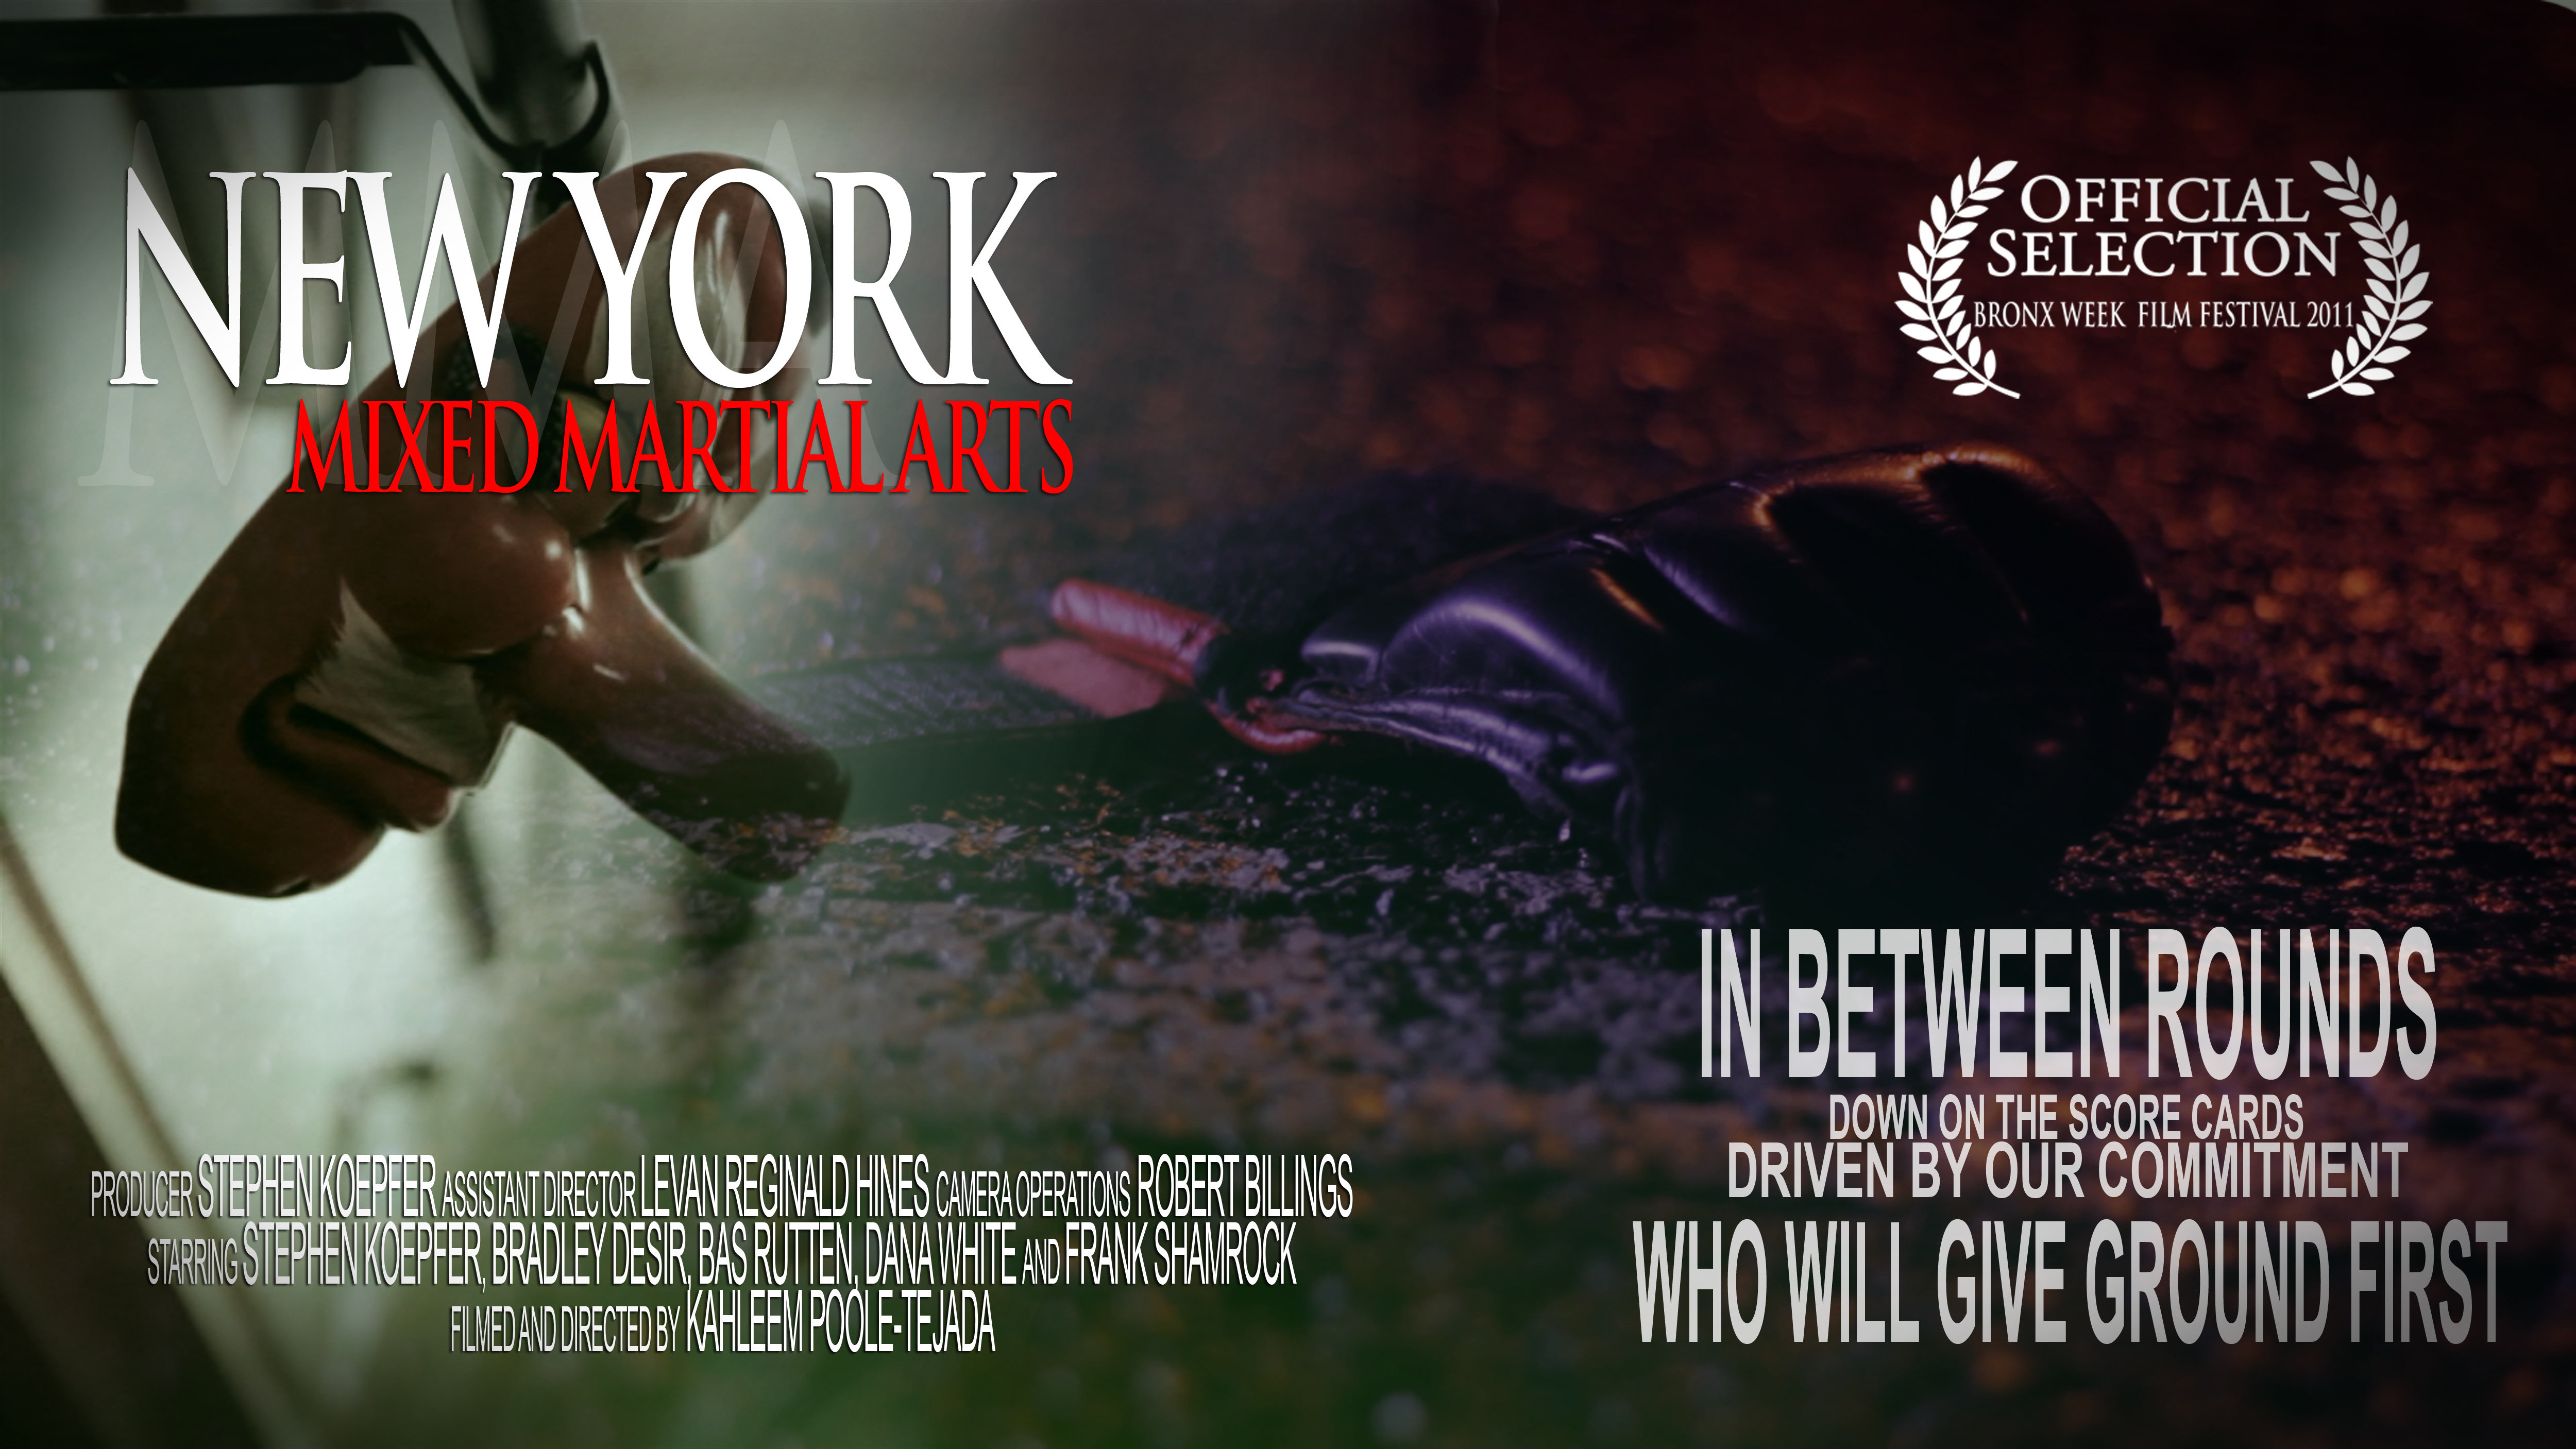 New York Mixed Martial Arts (2011)